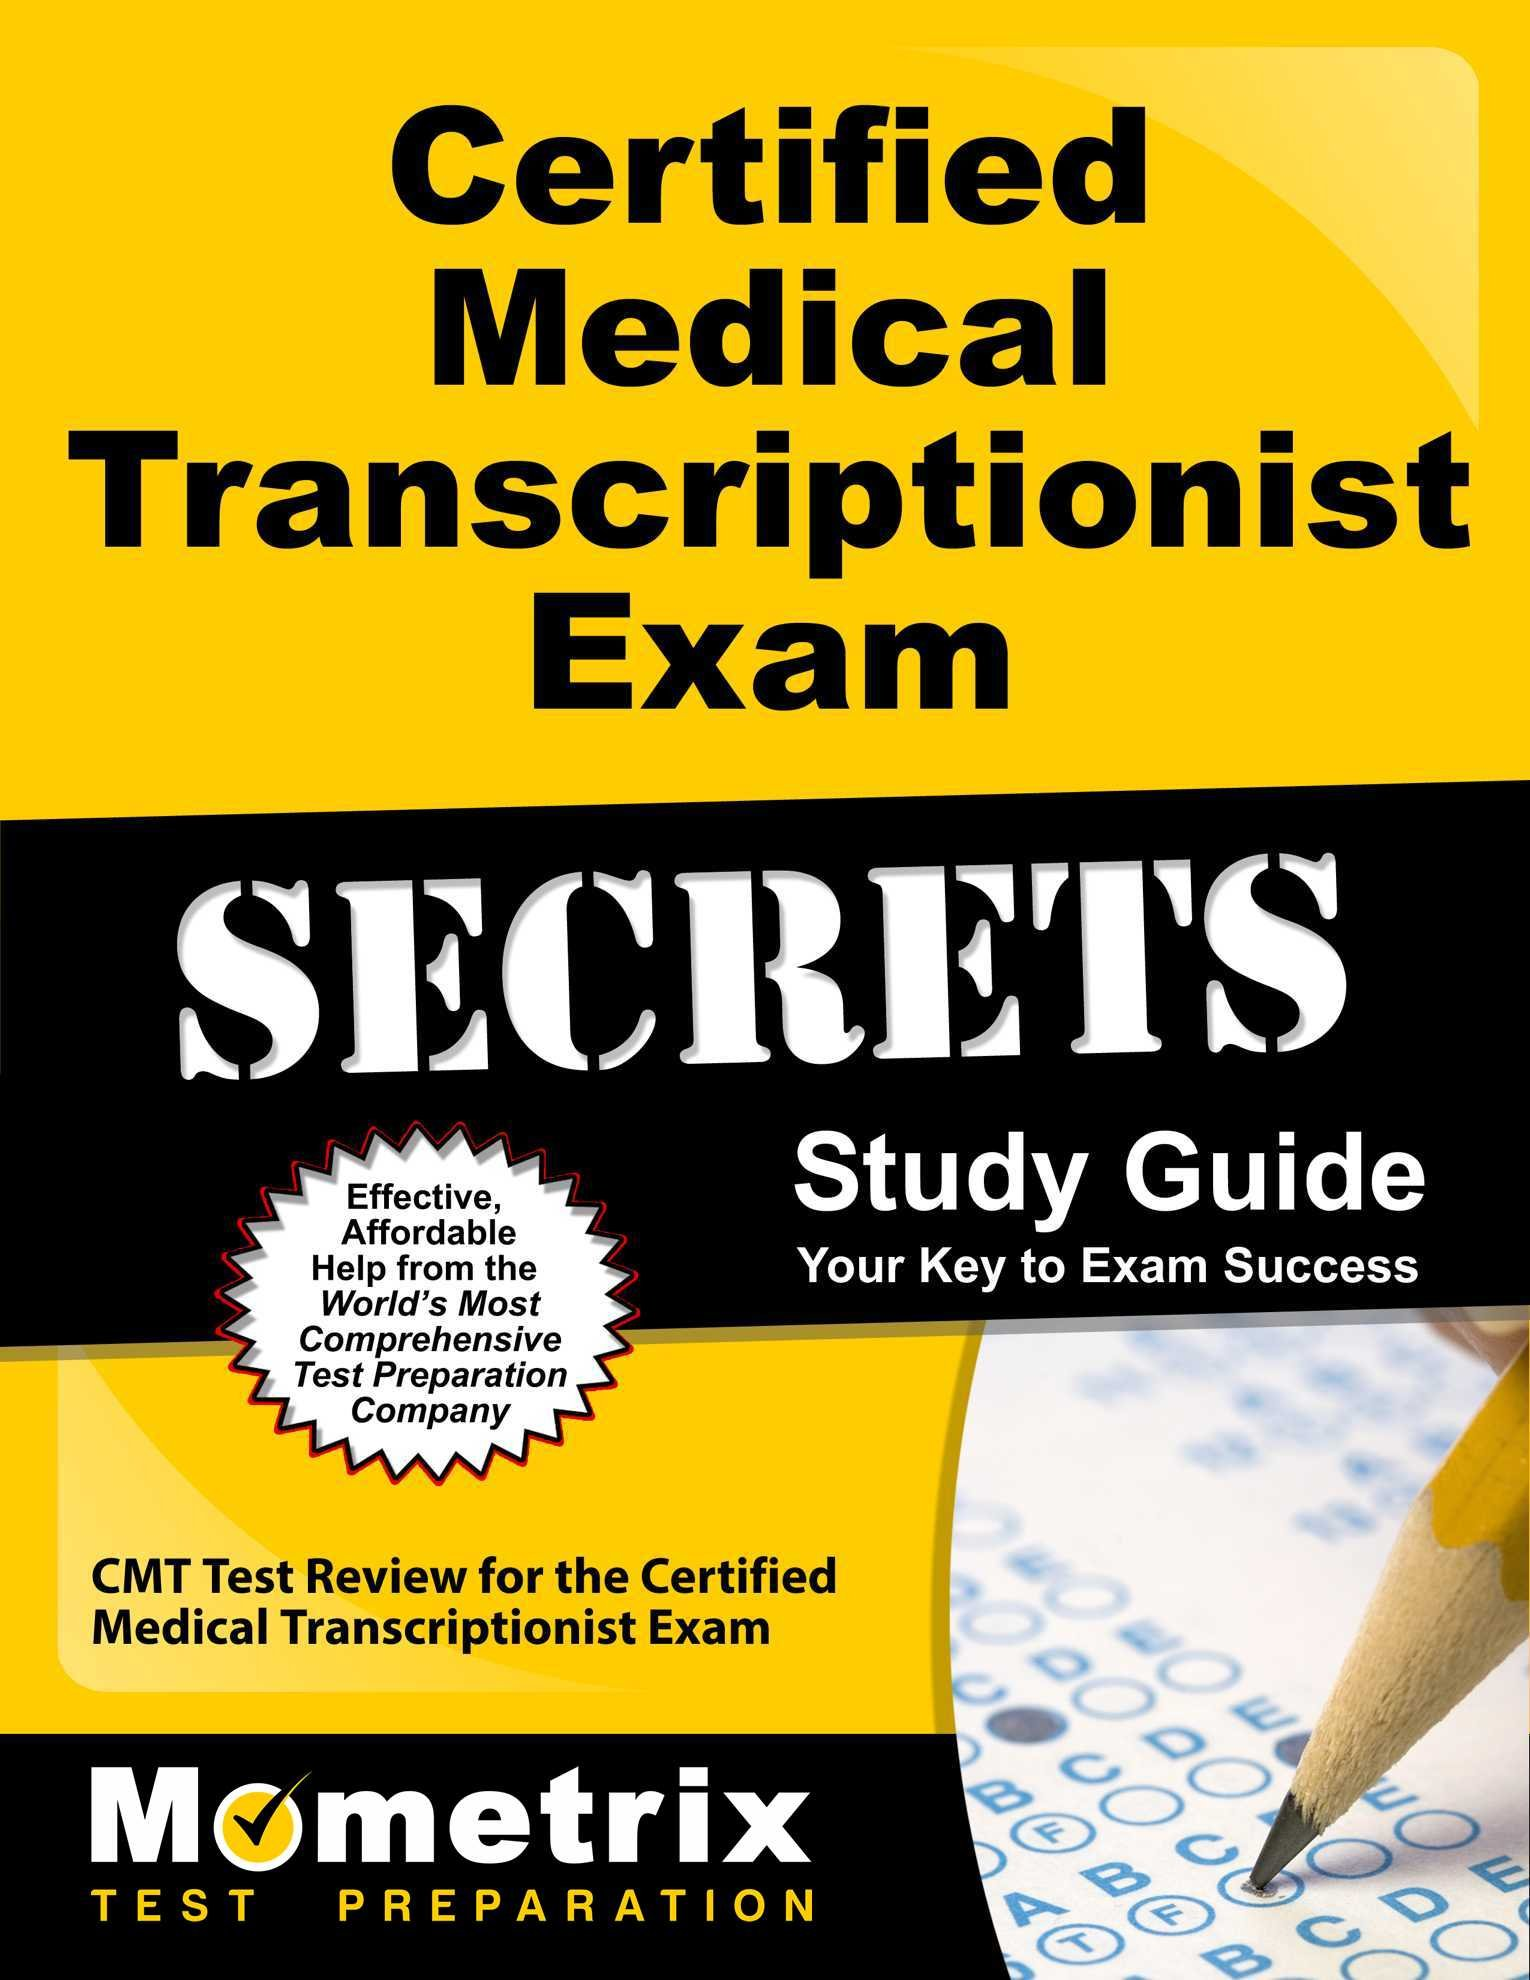 Buy Certified Medical Transcriptionist Exam Secrets Cmt Test Review